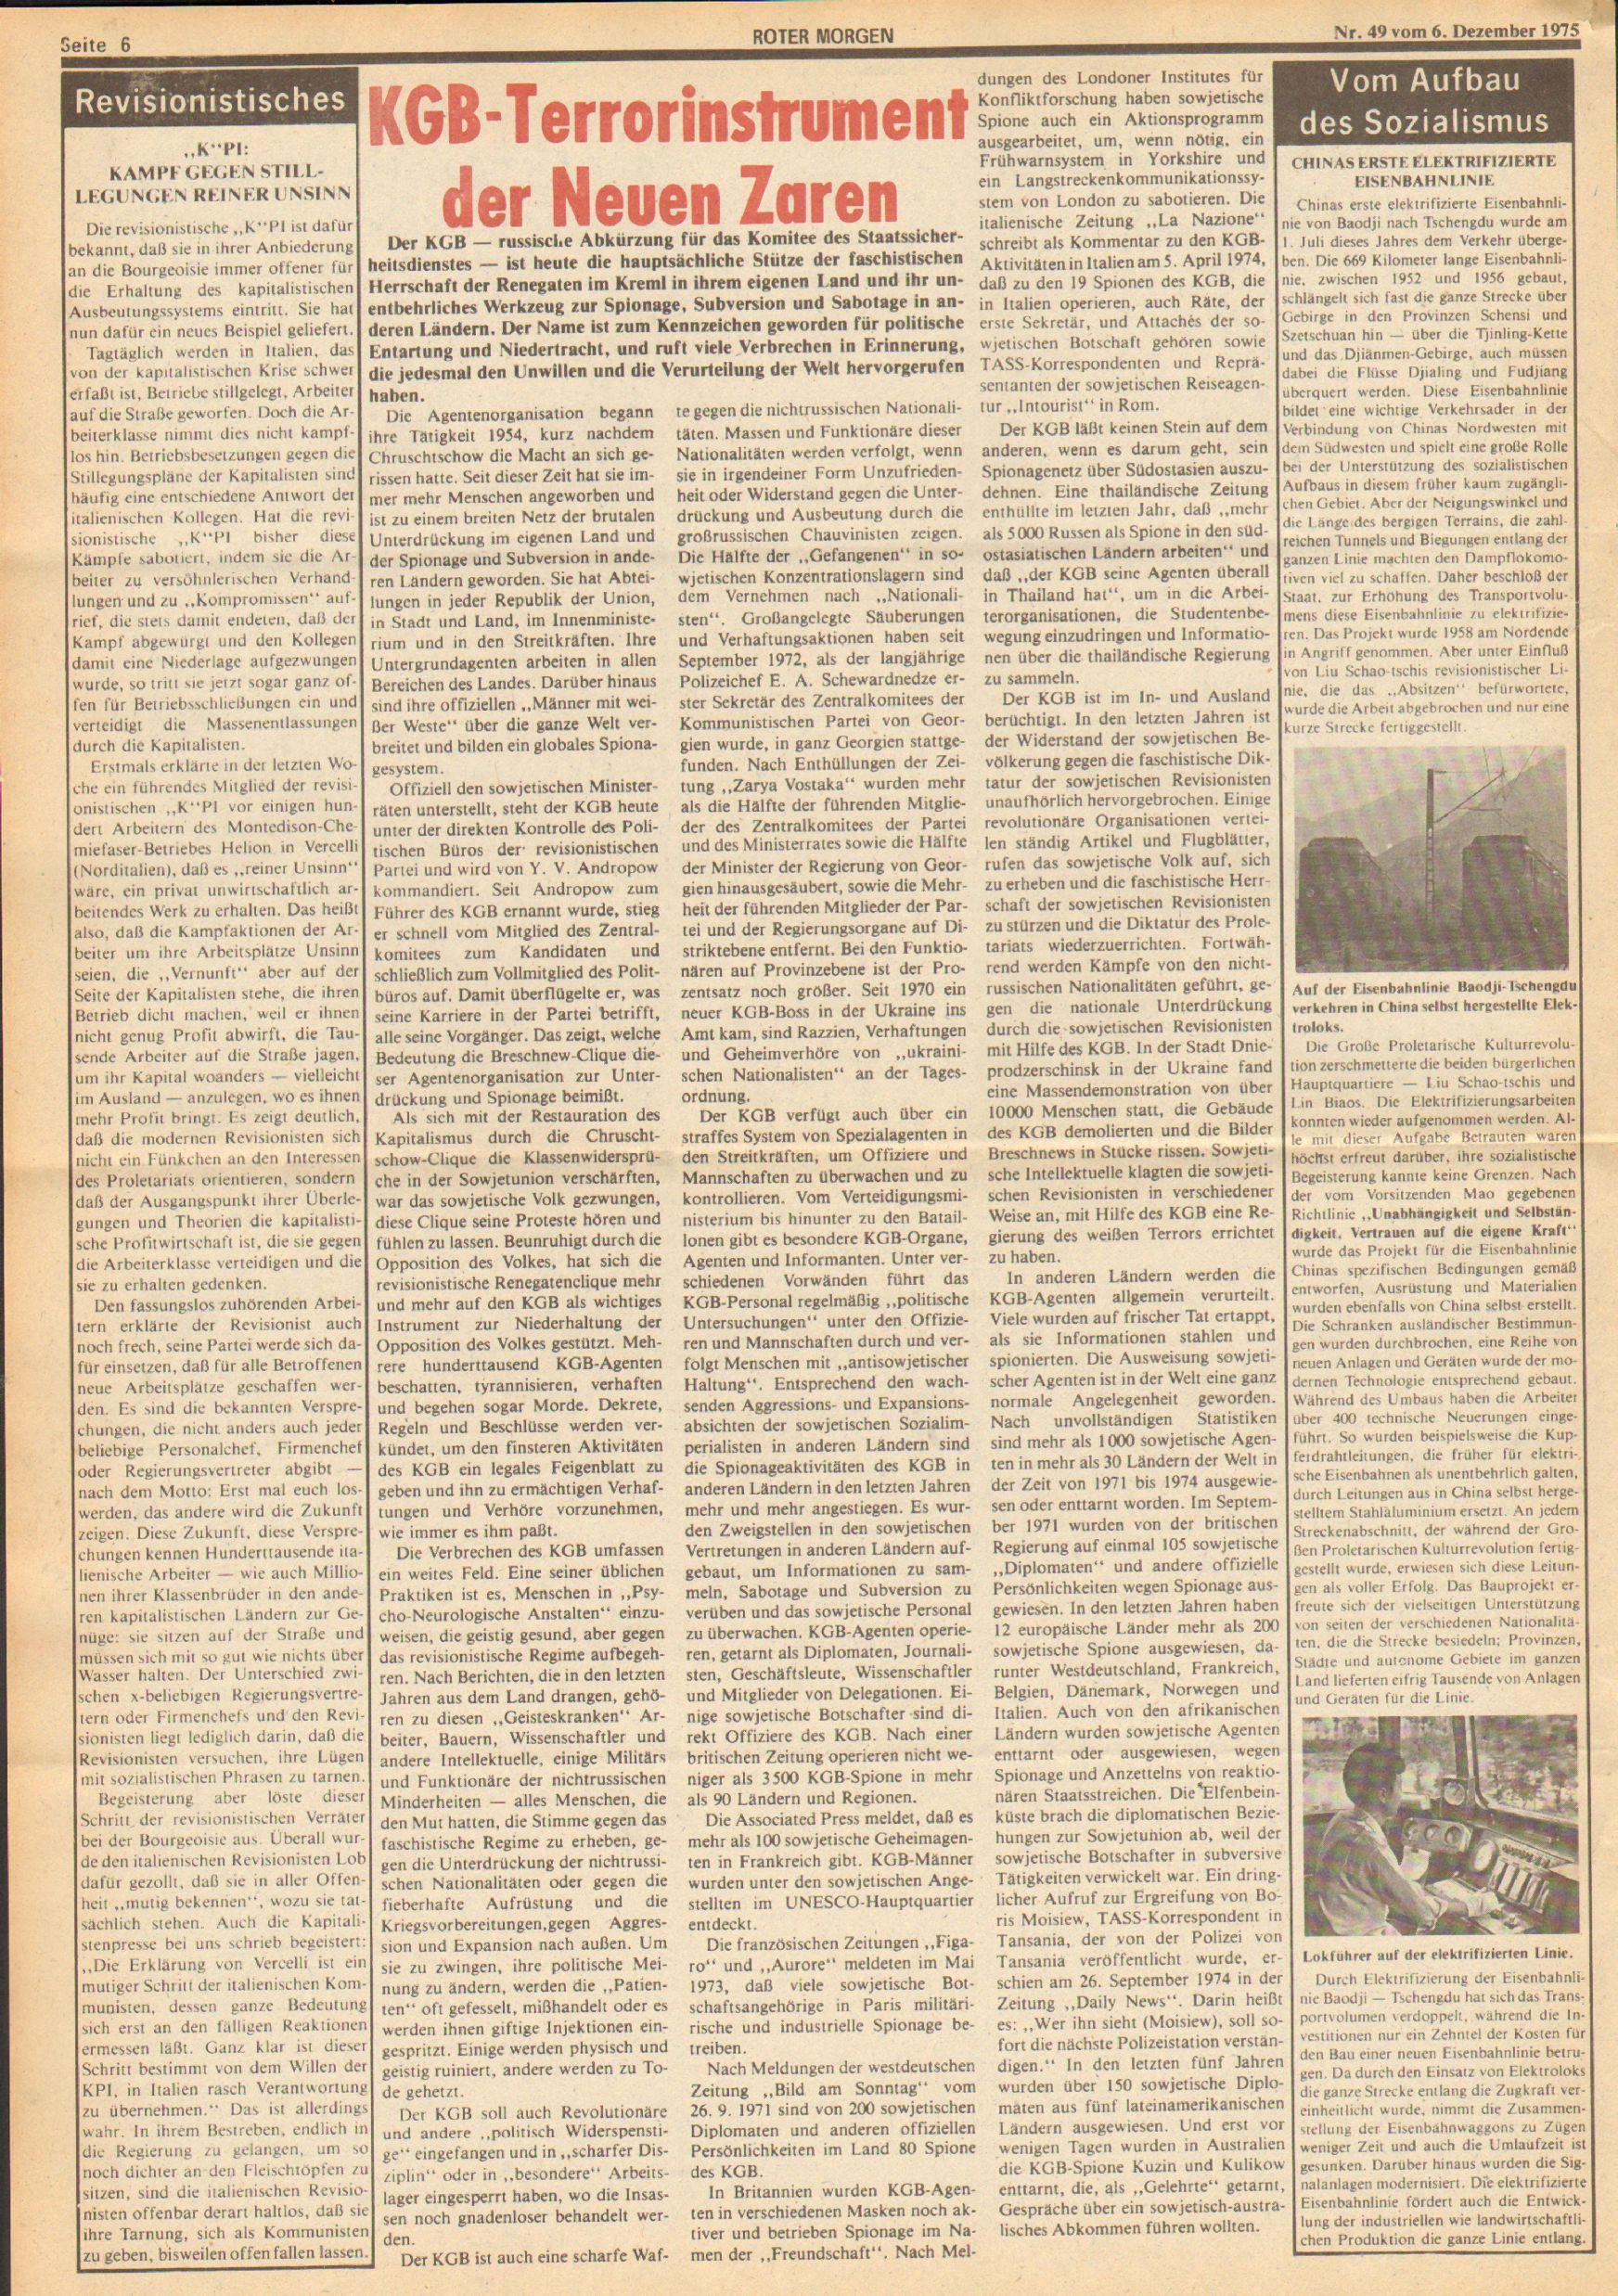 Roter Morgen, 9. Jg., 6. Dezember 1975, Nr. 49, Seite 6